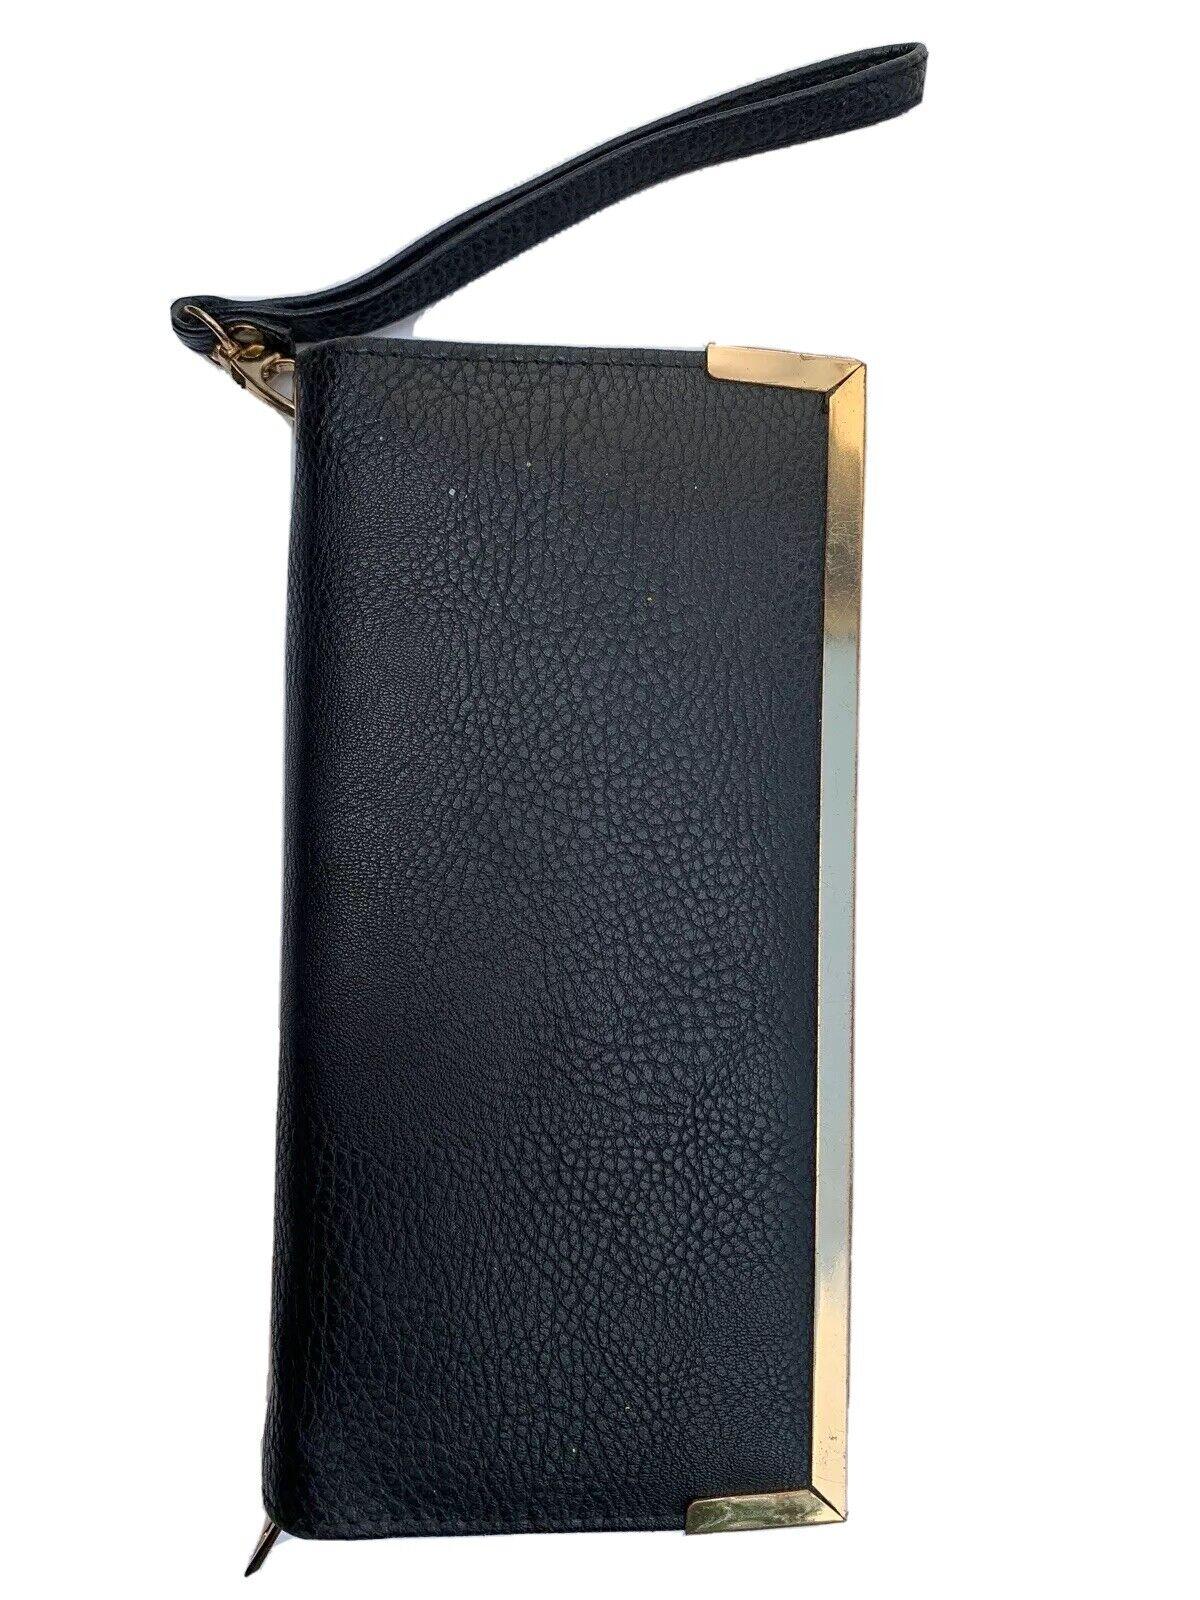 "Leather Black Gold Wallet Credit Card Pockets Inn Zip 8.5'x4.2"" Lovebly"